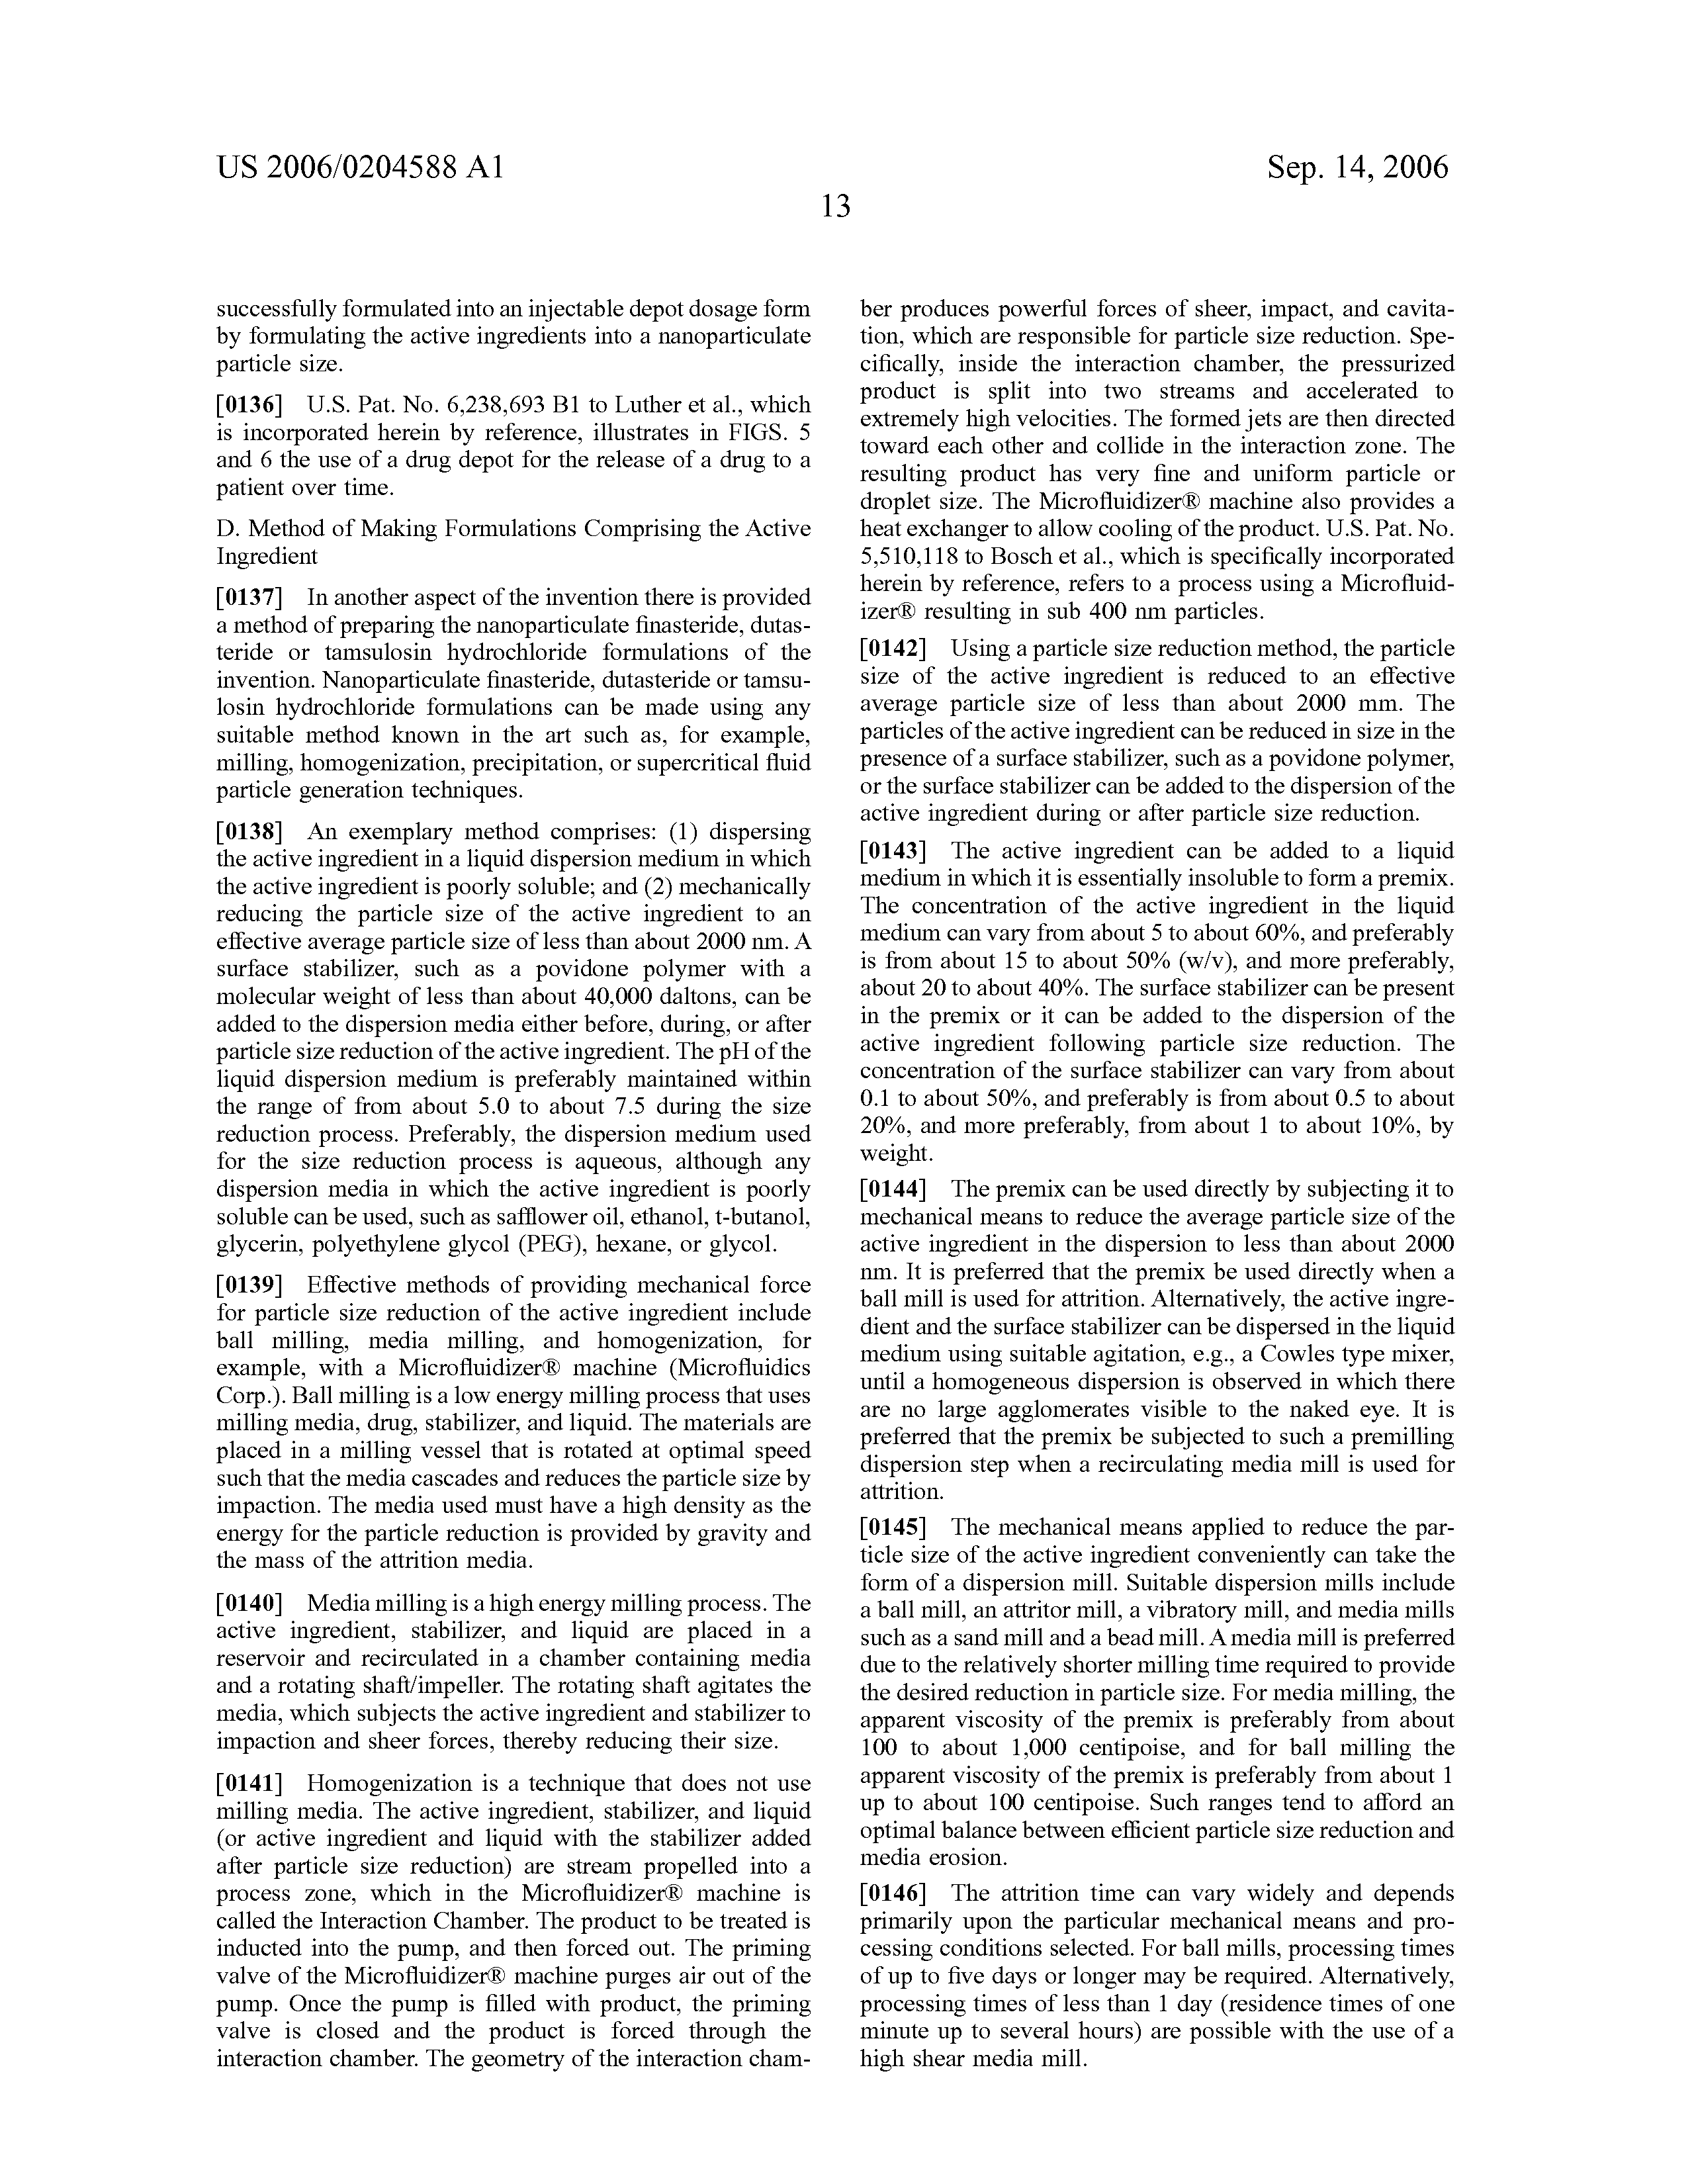 Avodart And Tamsulosin